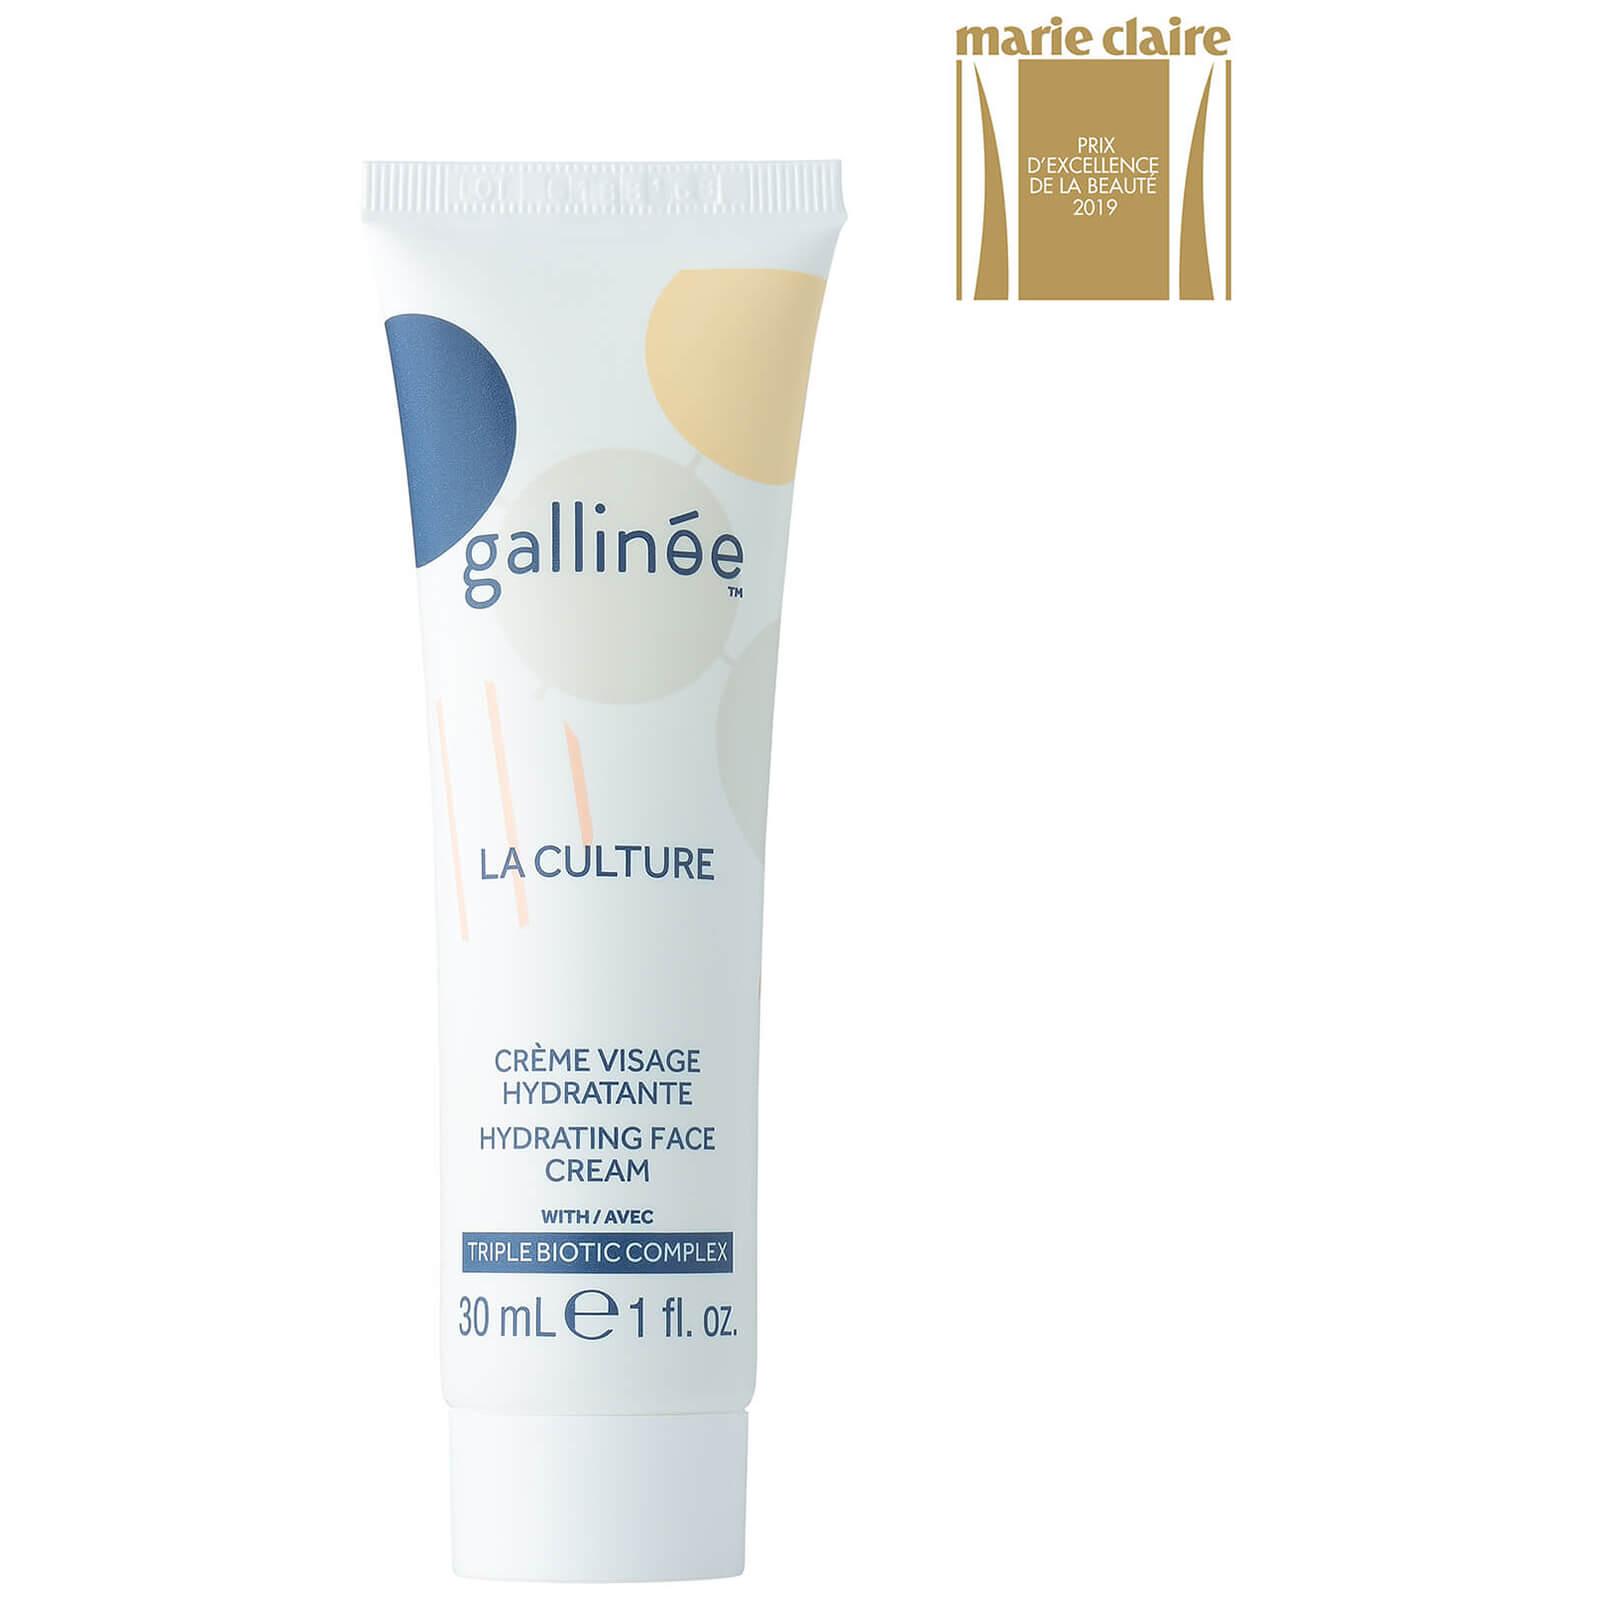 Gallinée Probiotic Hydrating Face Cream 30ml